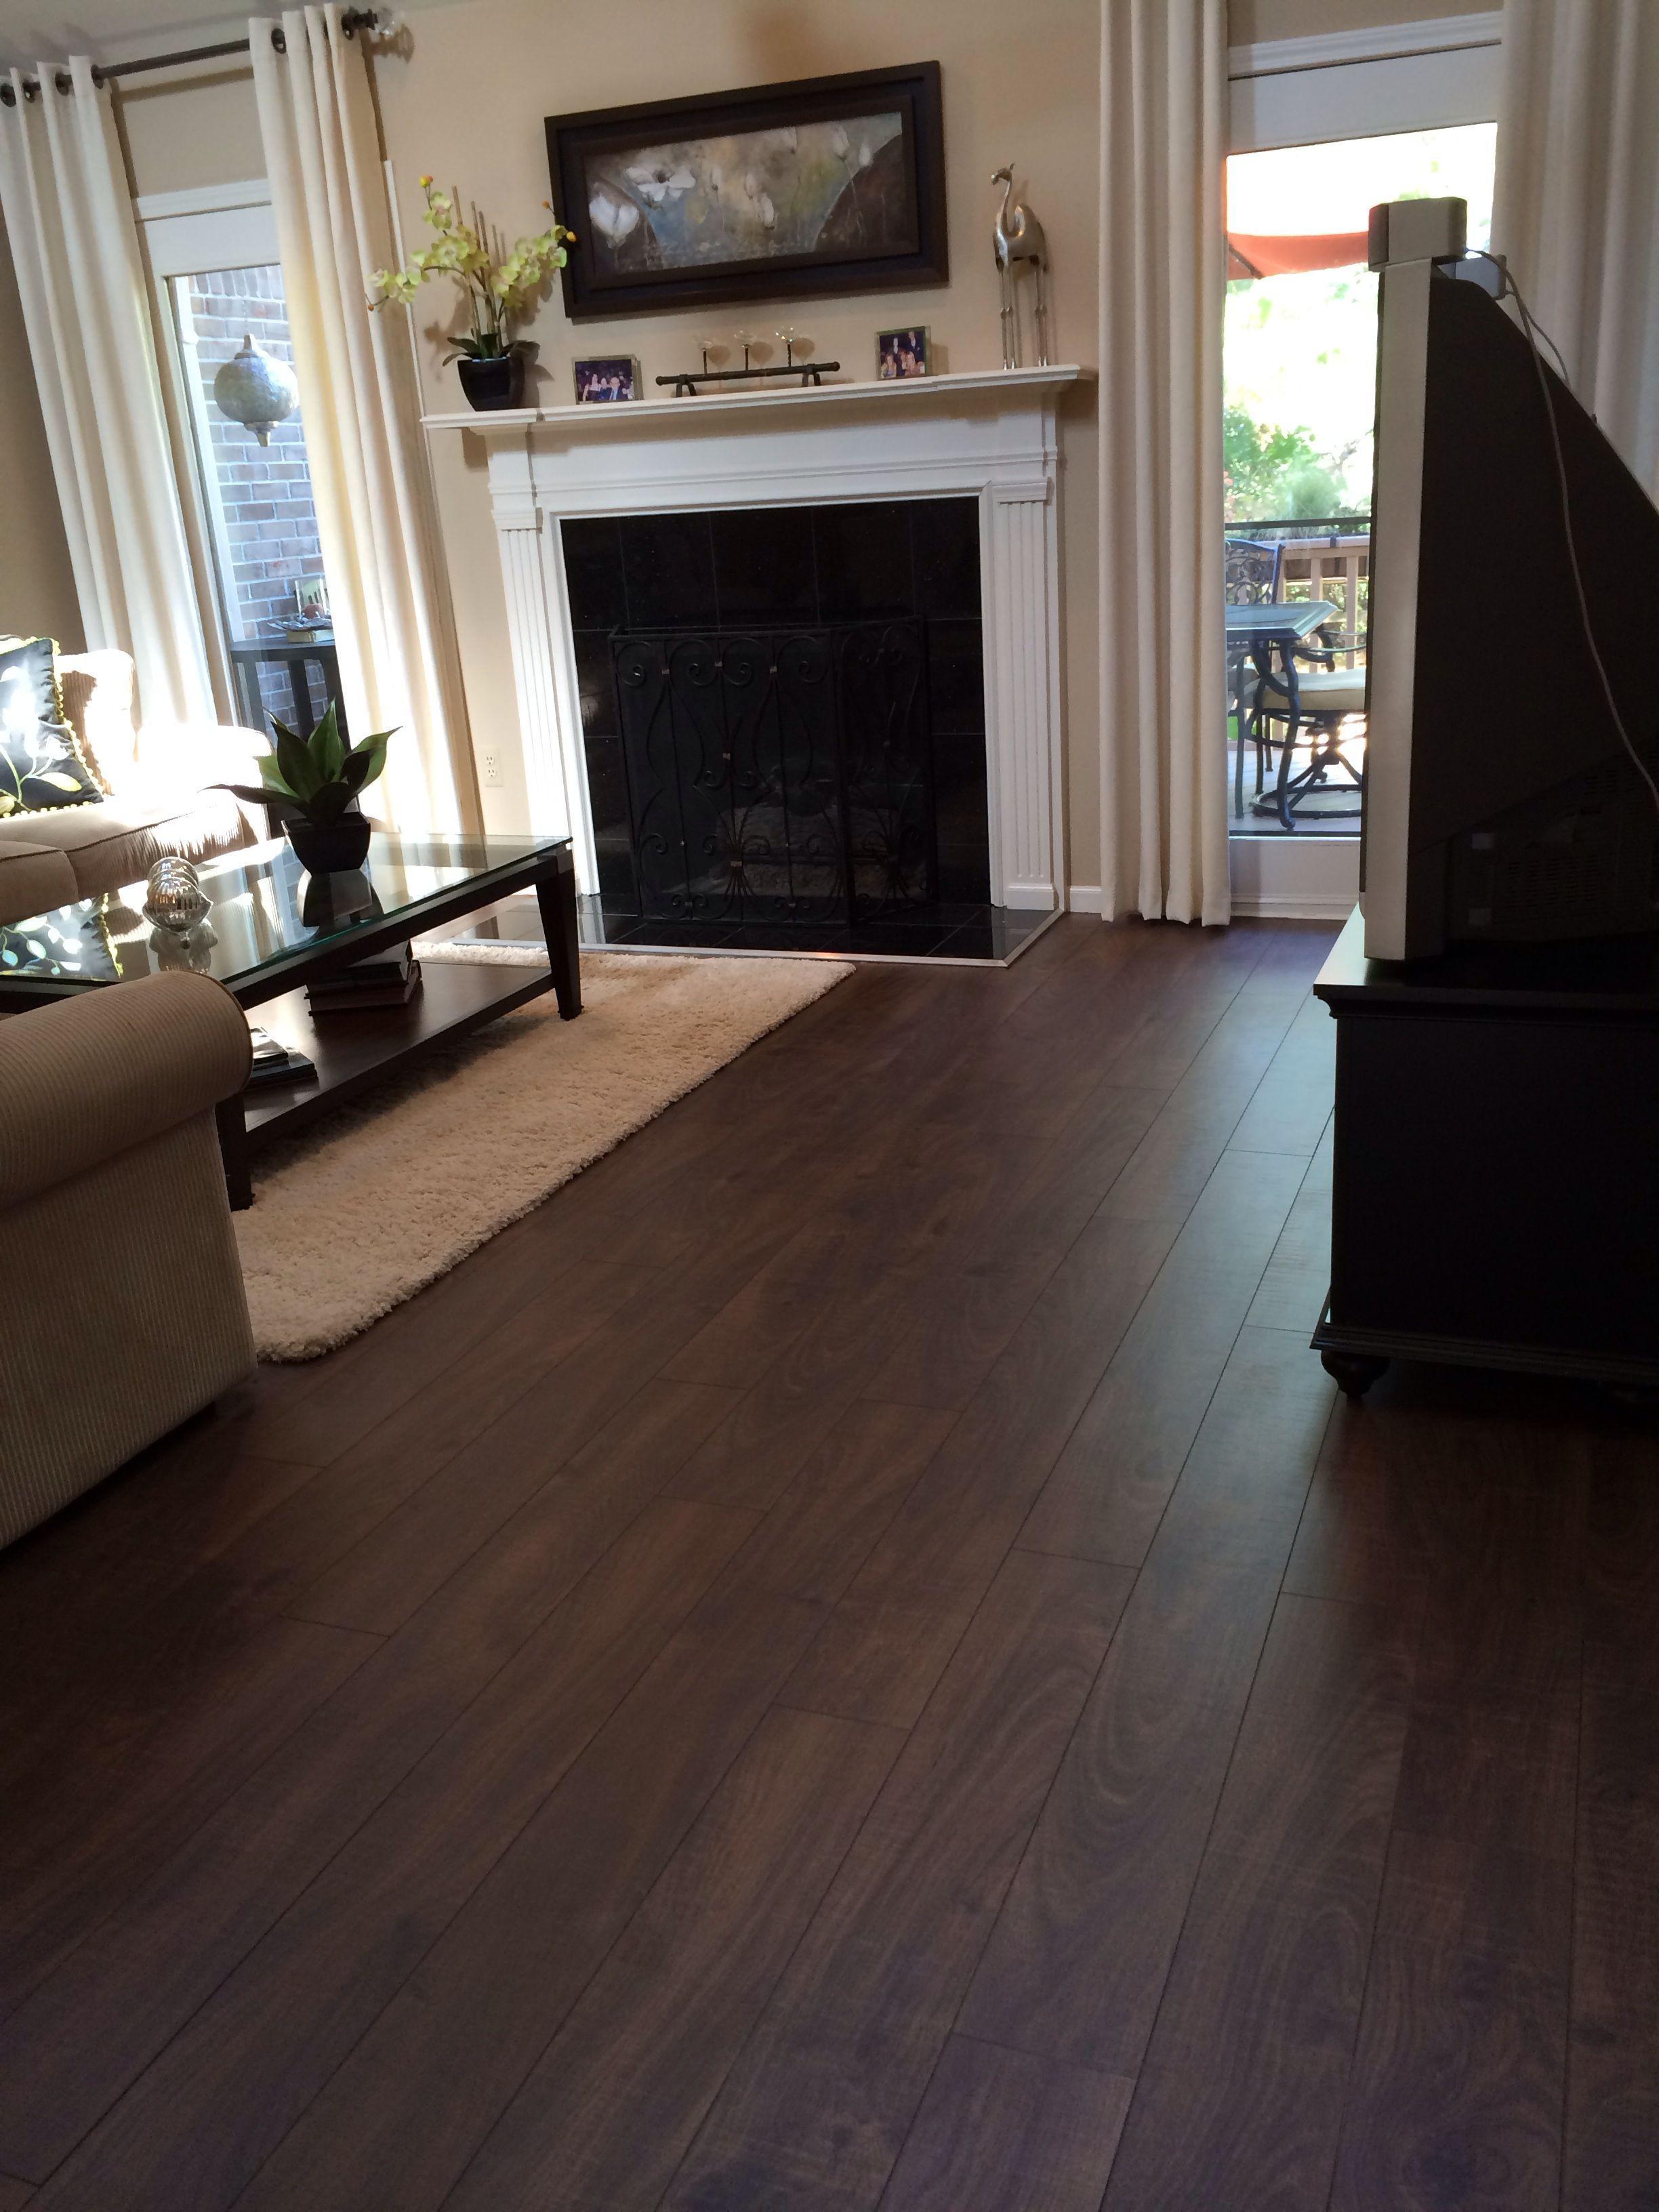 jasper prefinished oak hardwood flooring of floating hardwood floor transition from tile to wood floors light to for floating hardwood floor how to install floating laminate wood flooring part 2 the